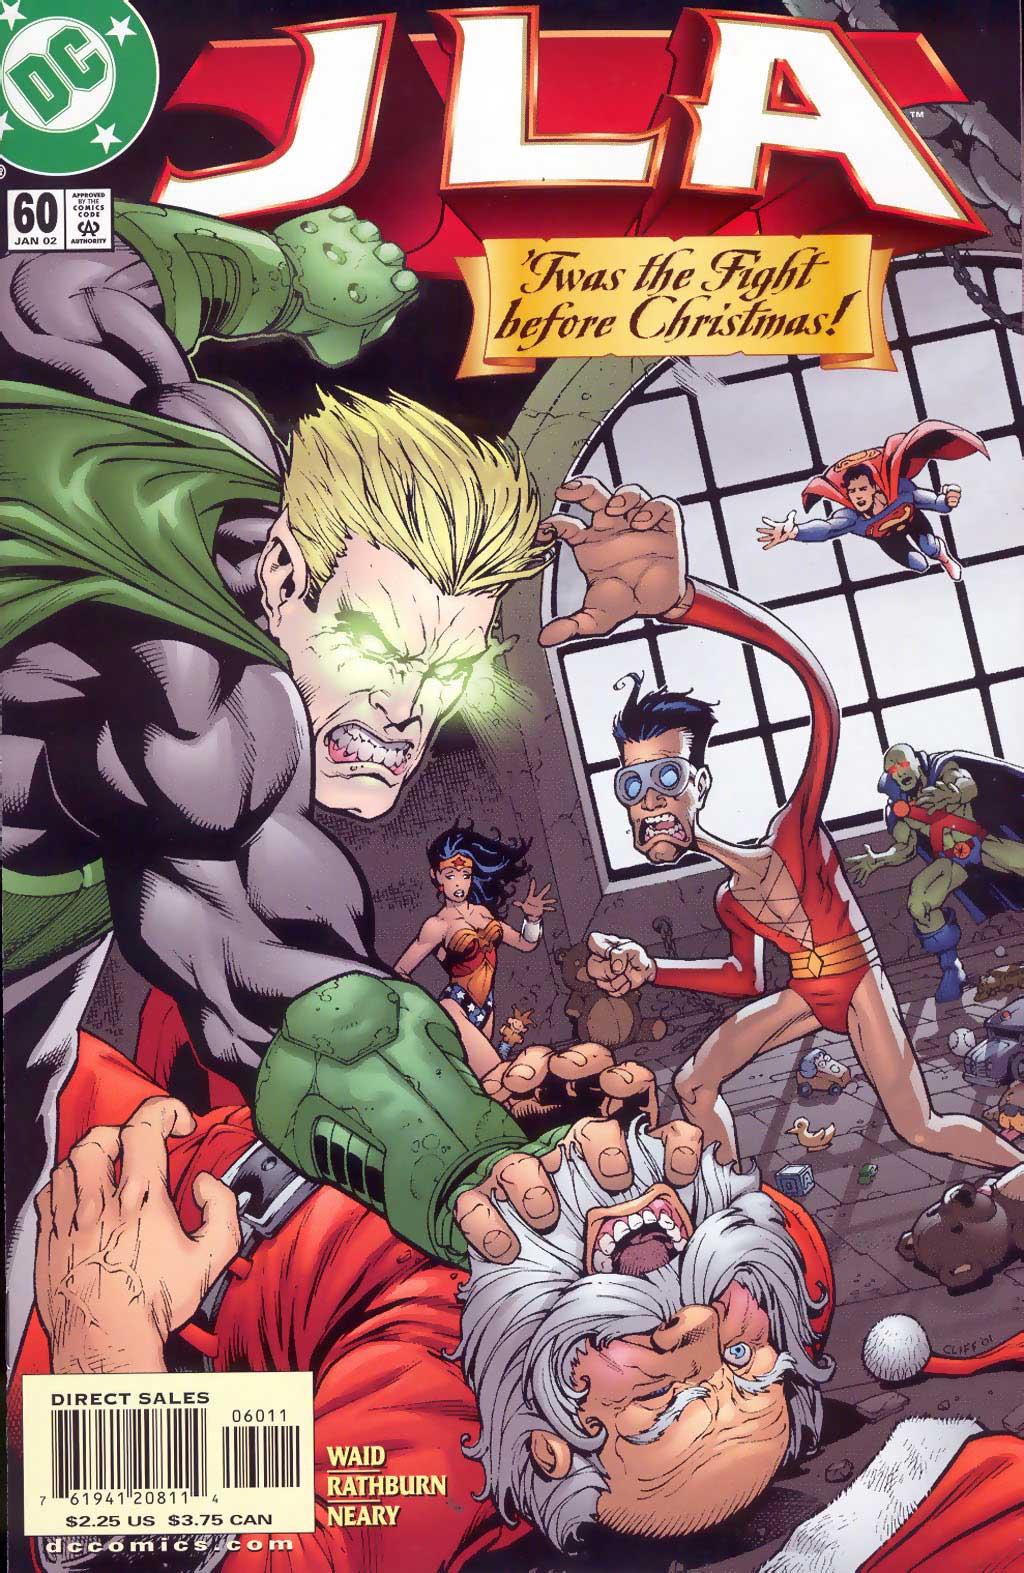 JLA #60 by Mark Waid, Cliff Rathburn, and Paul Neary